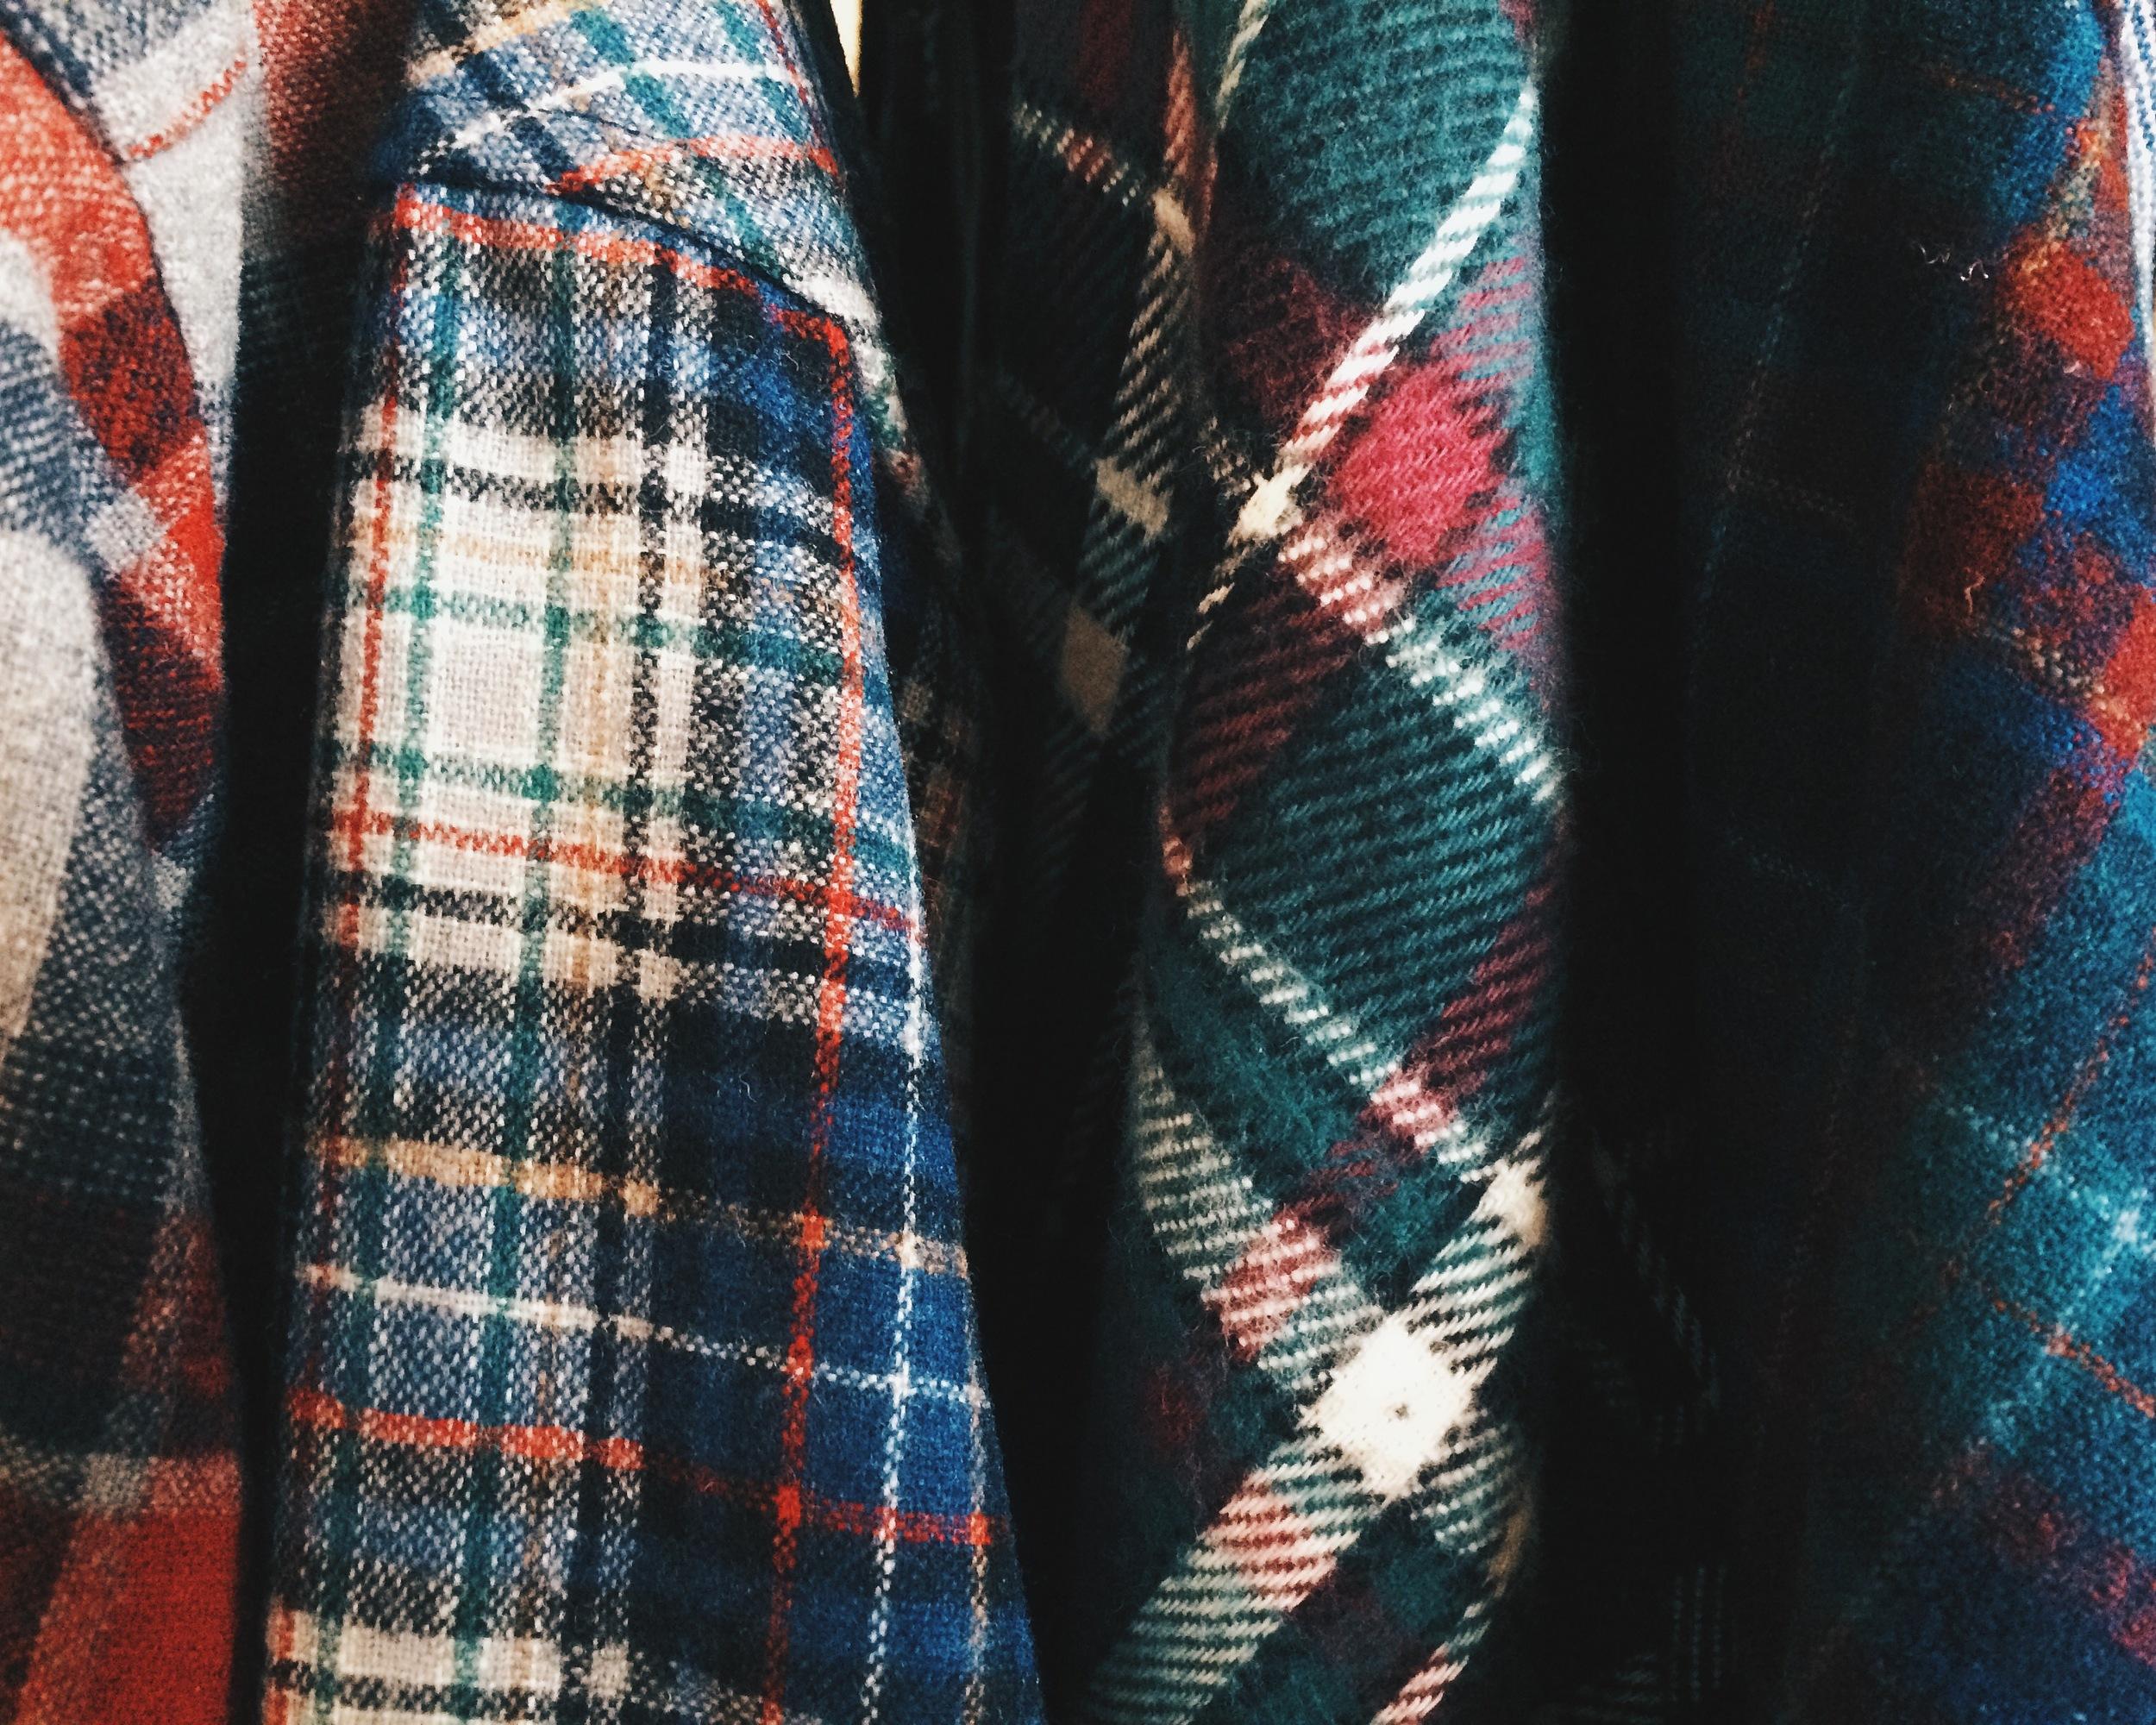 Wool and wool and wool and wool at Dime Handmade. Go get warm with Pendleton.